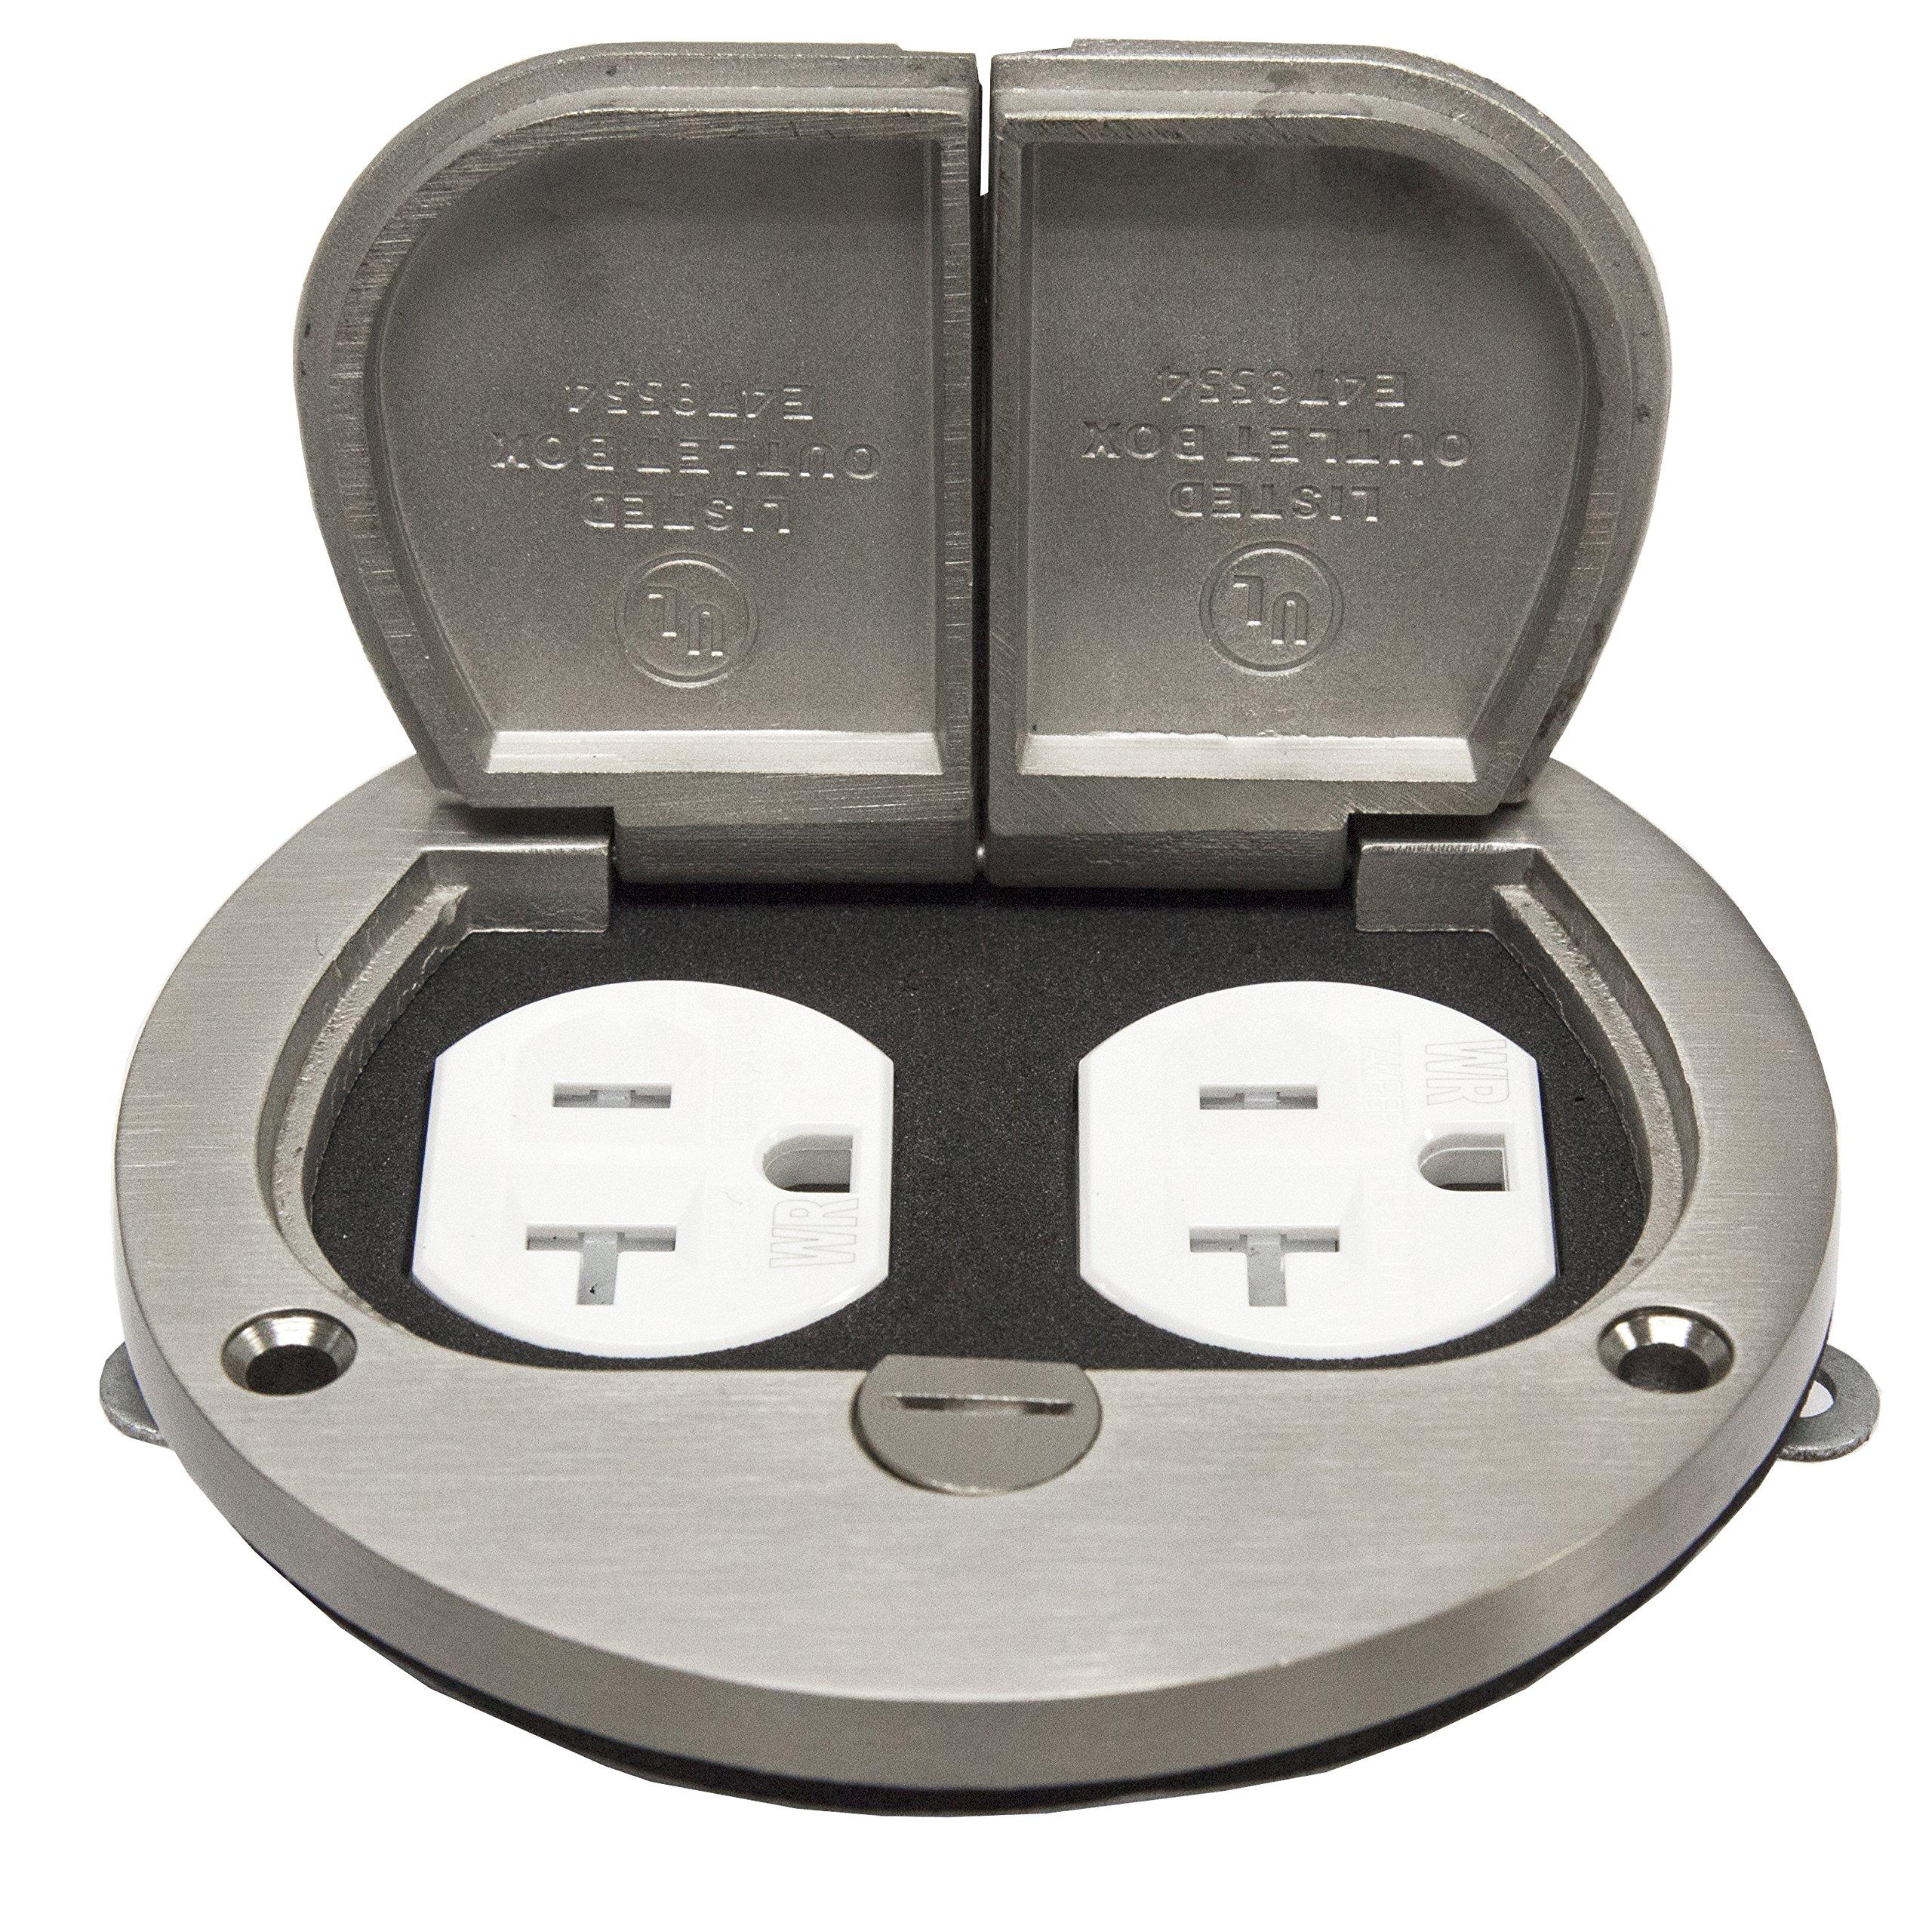 Enerlites 975503-S 4''  Nickel Plated Brass Hinged Floor Box Cover, 20A Duplex Tamper-Weather Resistant Receptacle